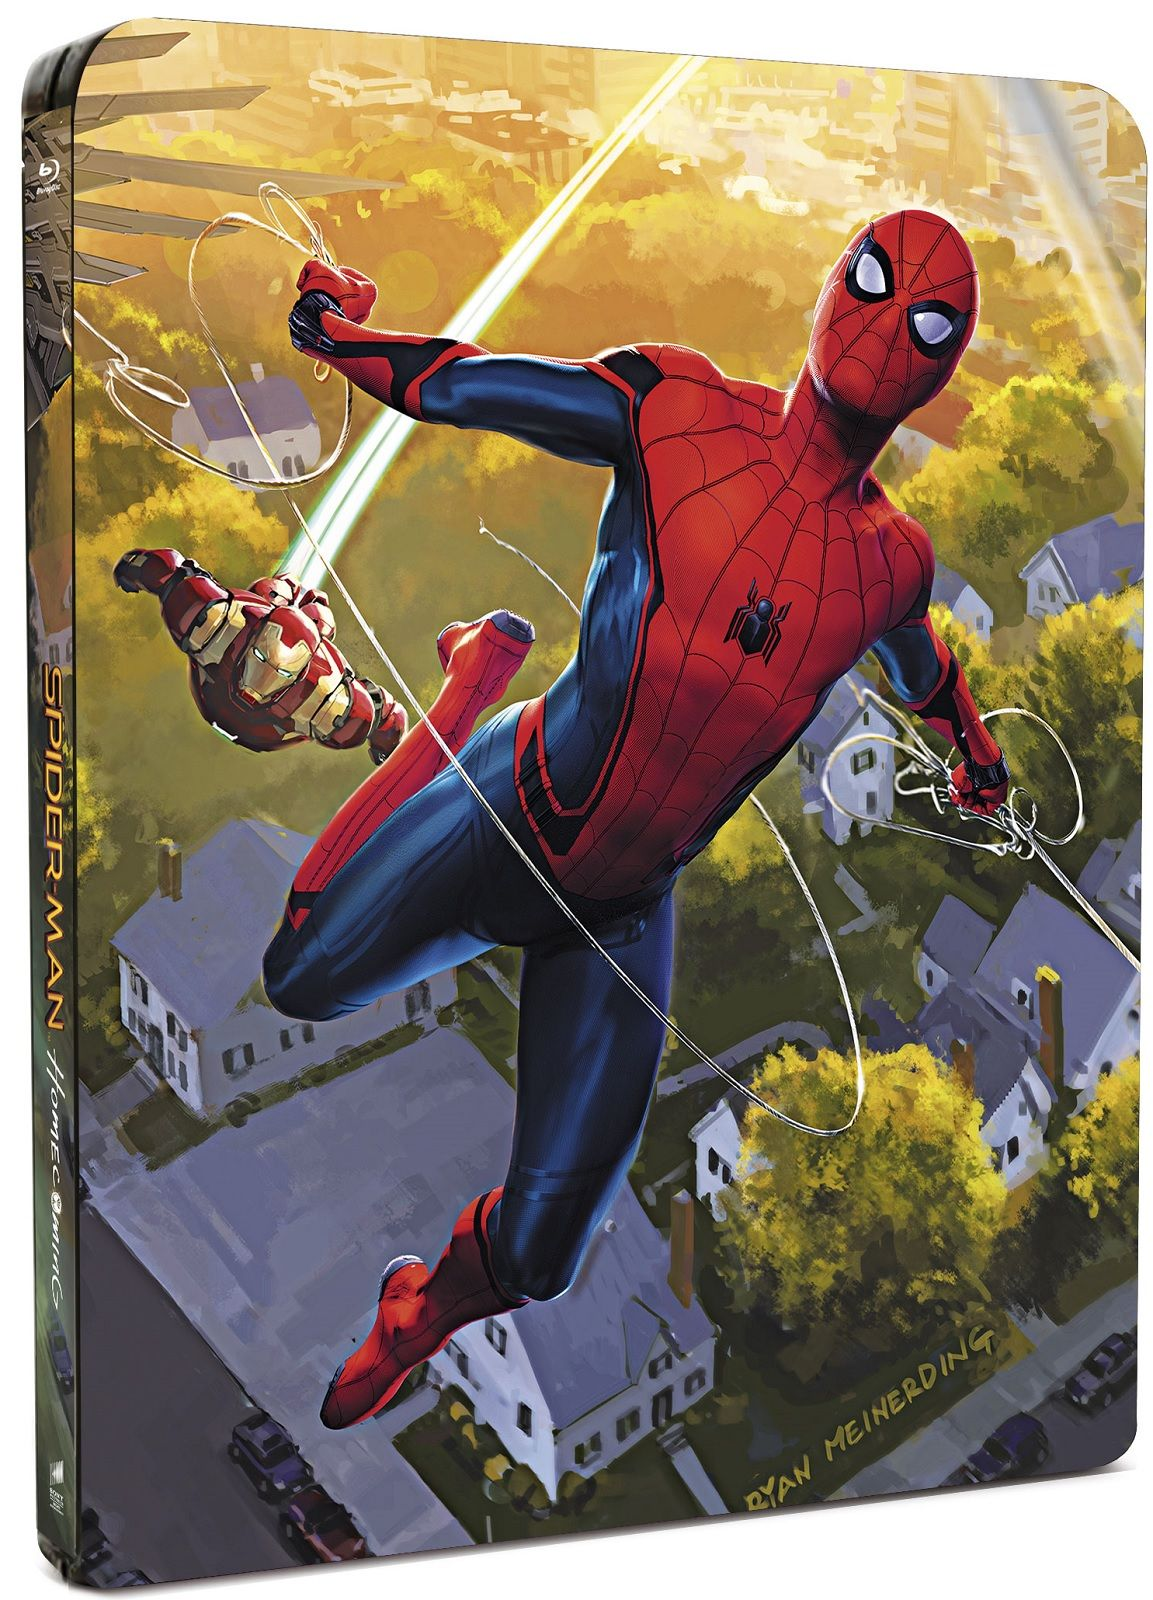 Спайдър-мен: Завръщане у дома Steelbook Edition 3D+2D (Blu-Ray) - 2